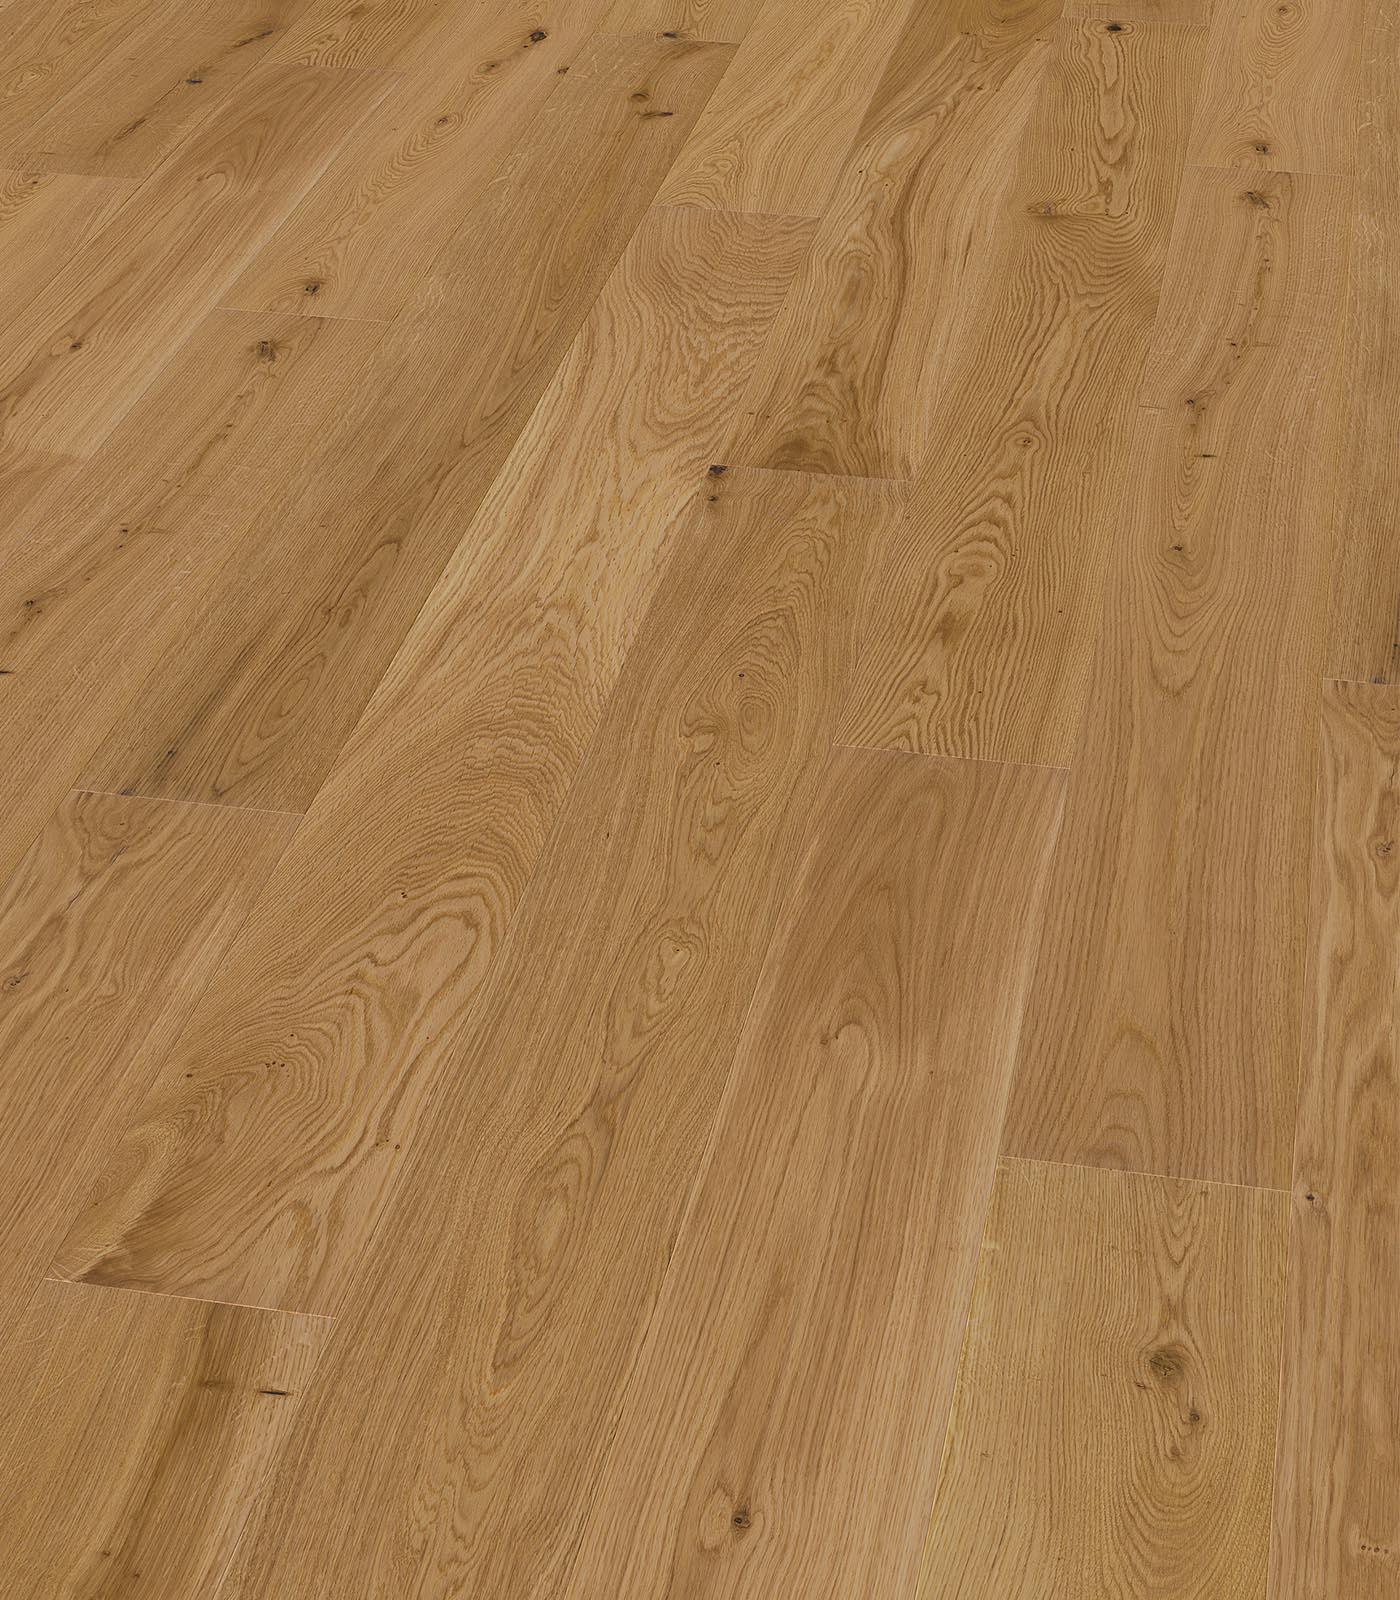 European-Oak-rustic-floors-Origins-Collection-angle